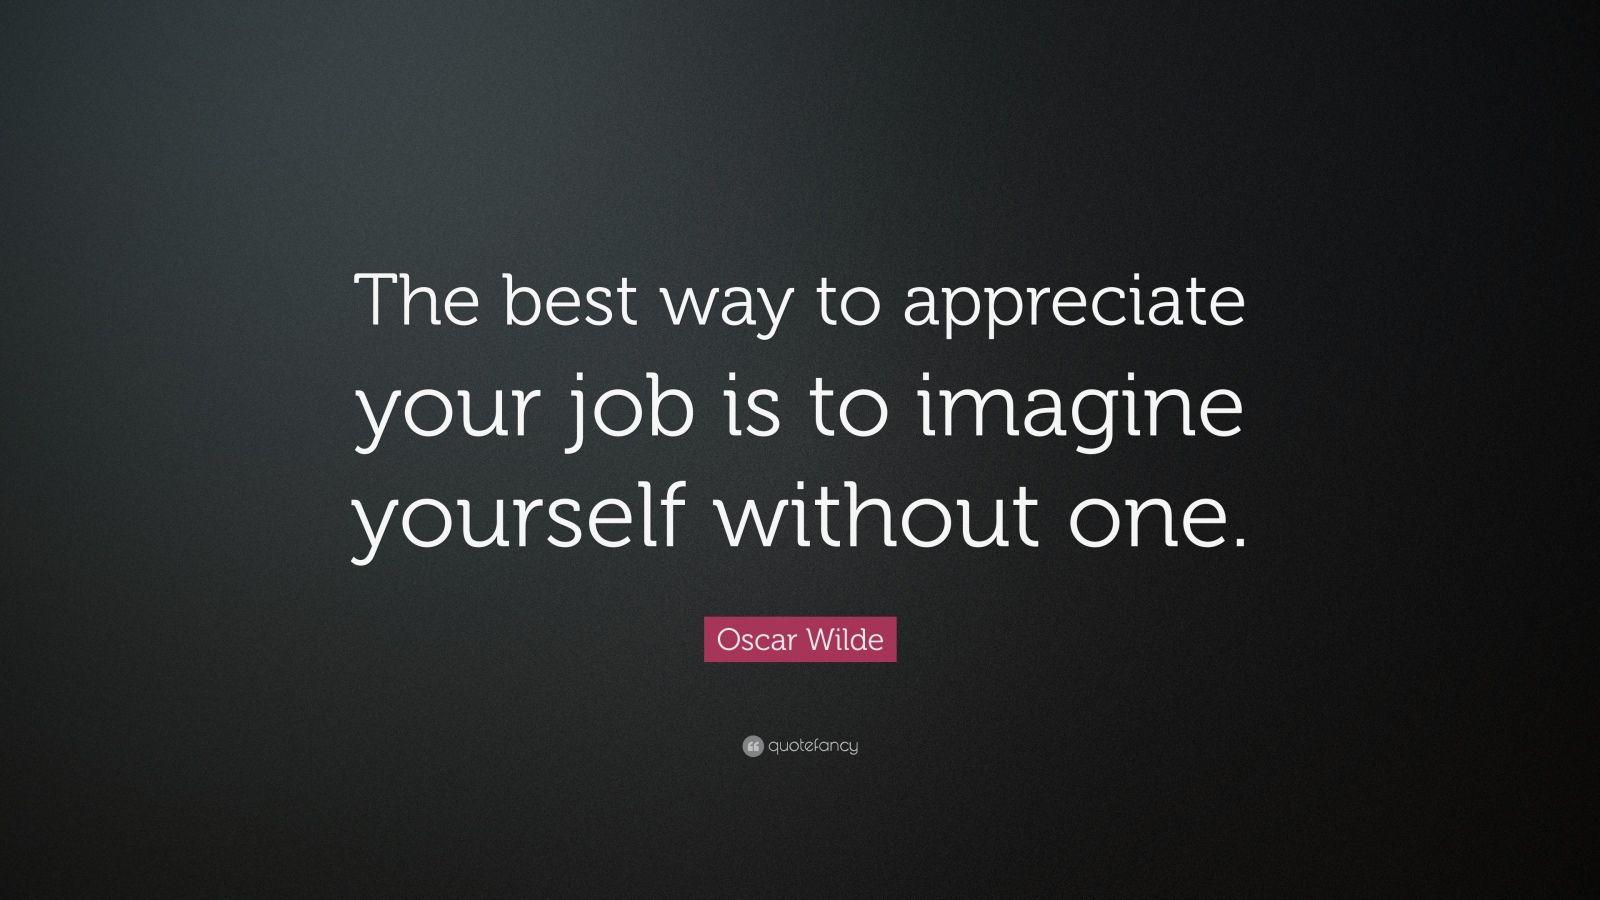 Oscar Wilde Quote The best way to appreciate your job is